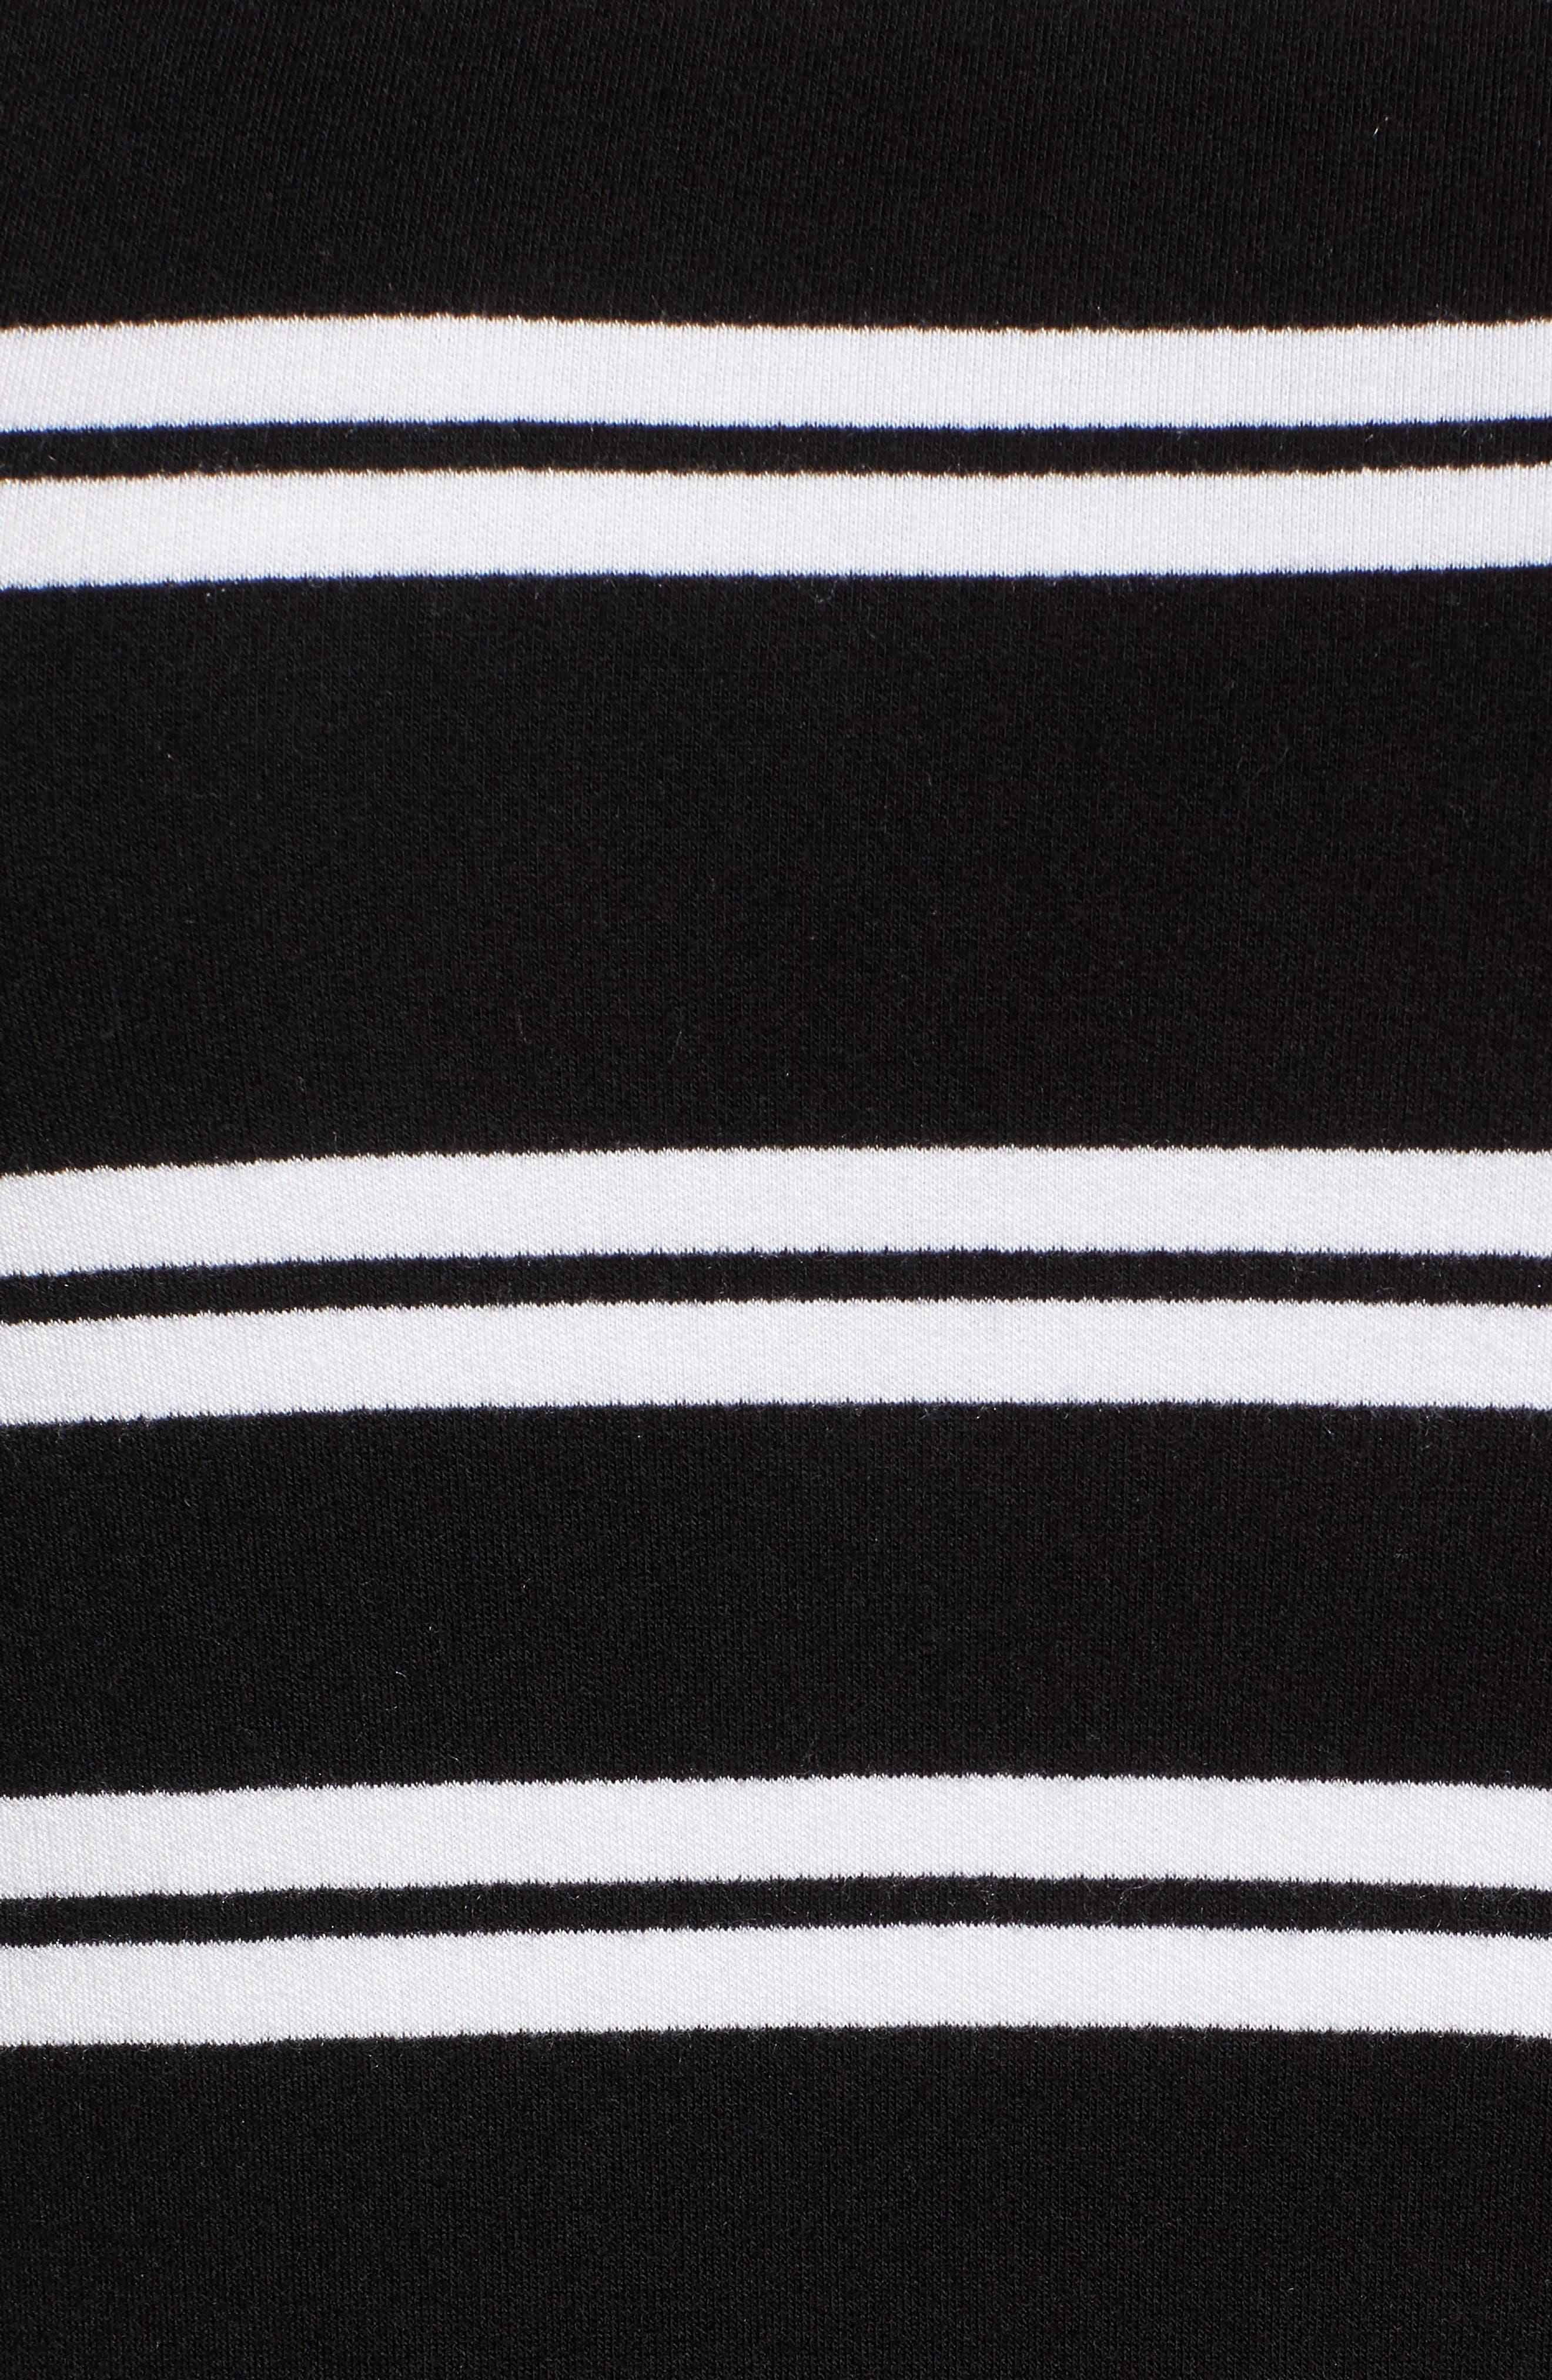 Sleeveless Stretch Knit Stripe Dress,                             Alternate thumbnail 10, color,